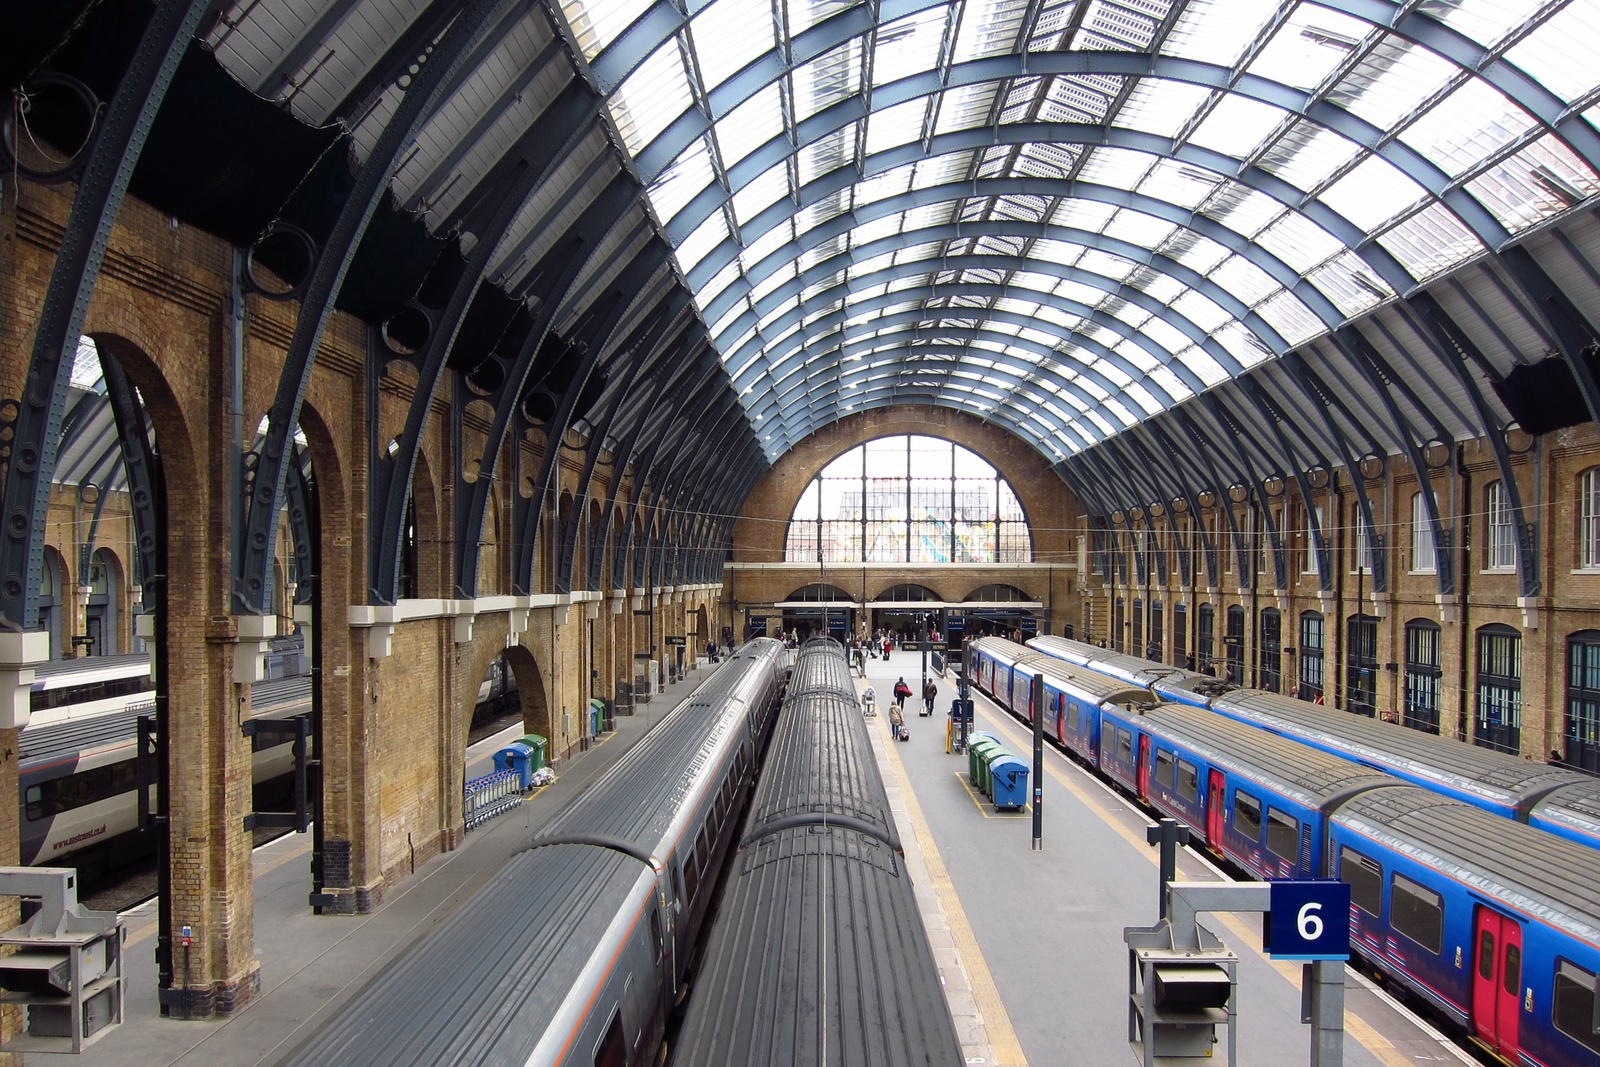 King Cross Station, London